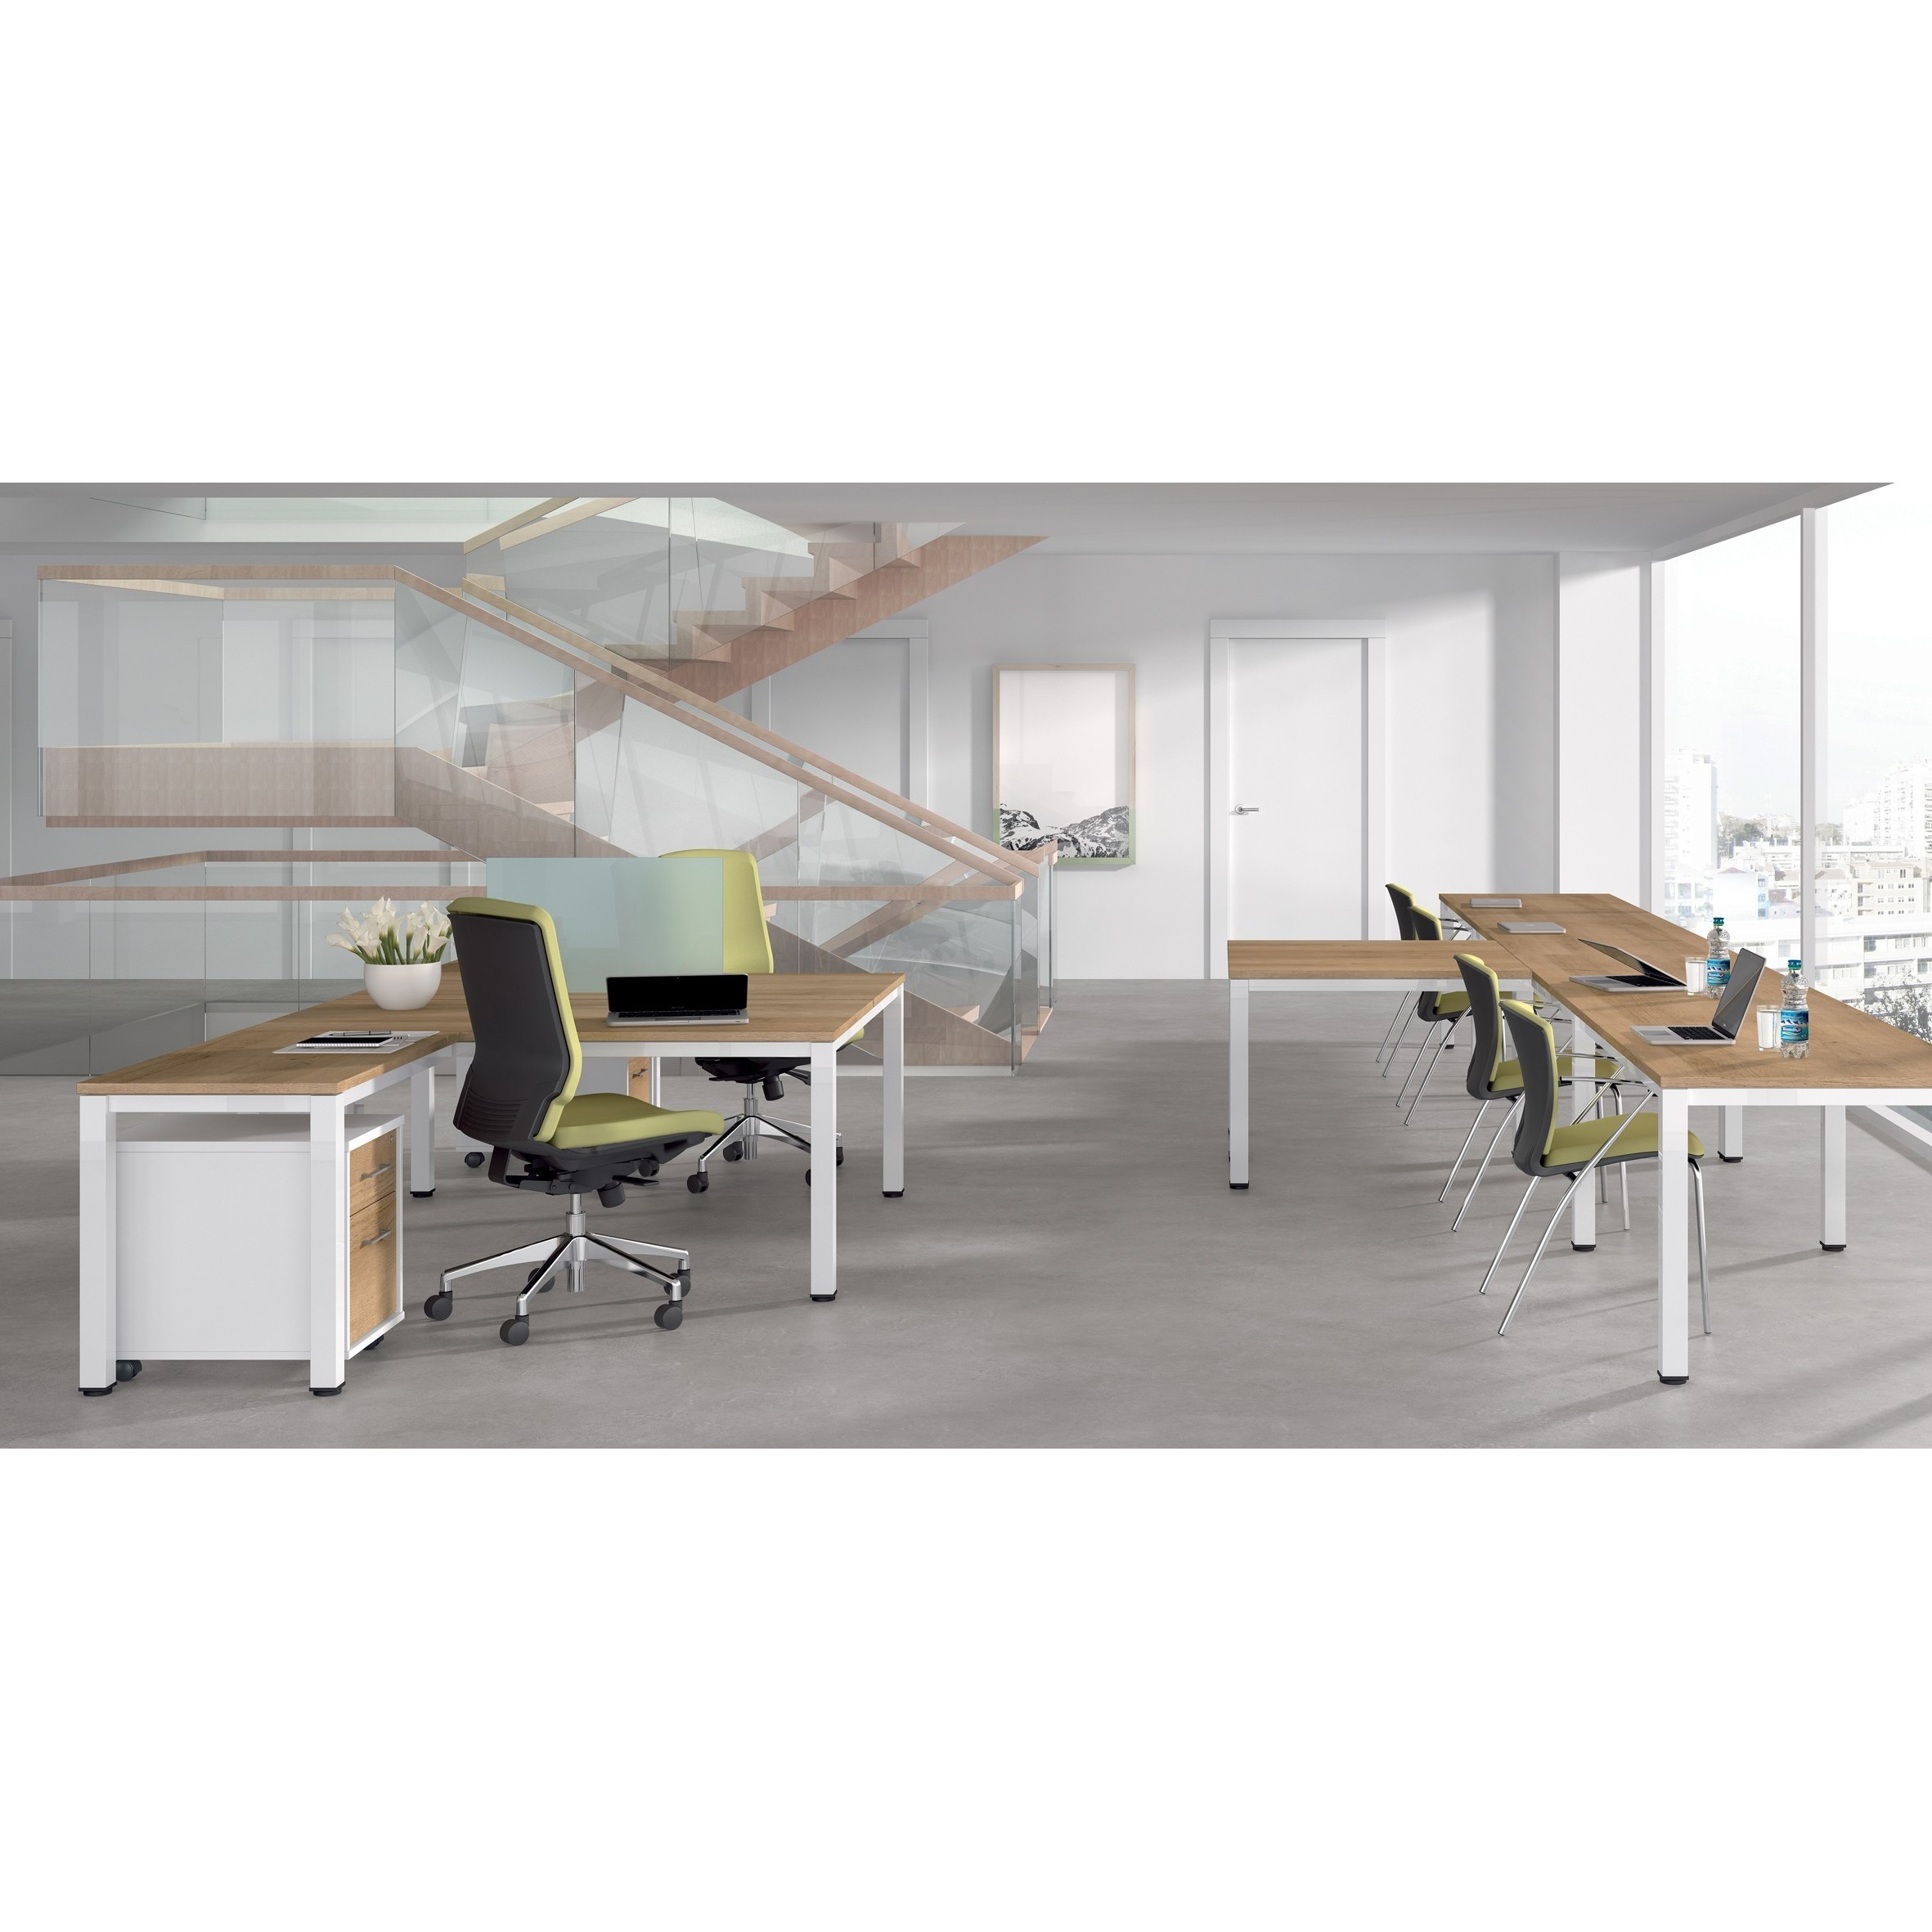 TABLE OFFICE 'S EXECUTIVE SERIES 140X80 CHROME/WHITE